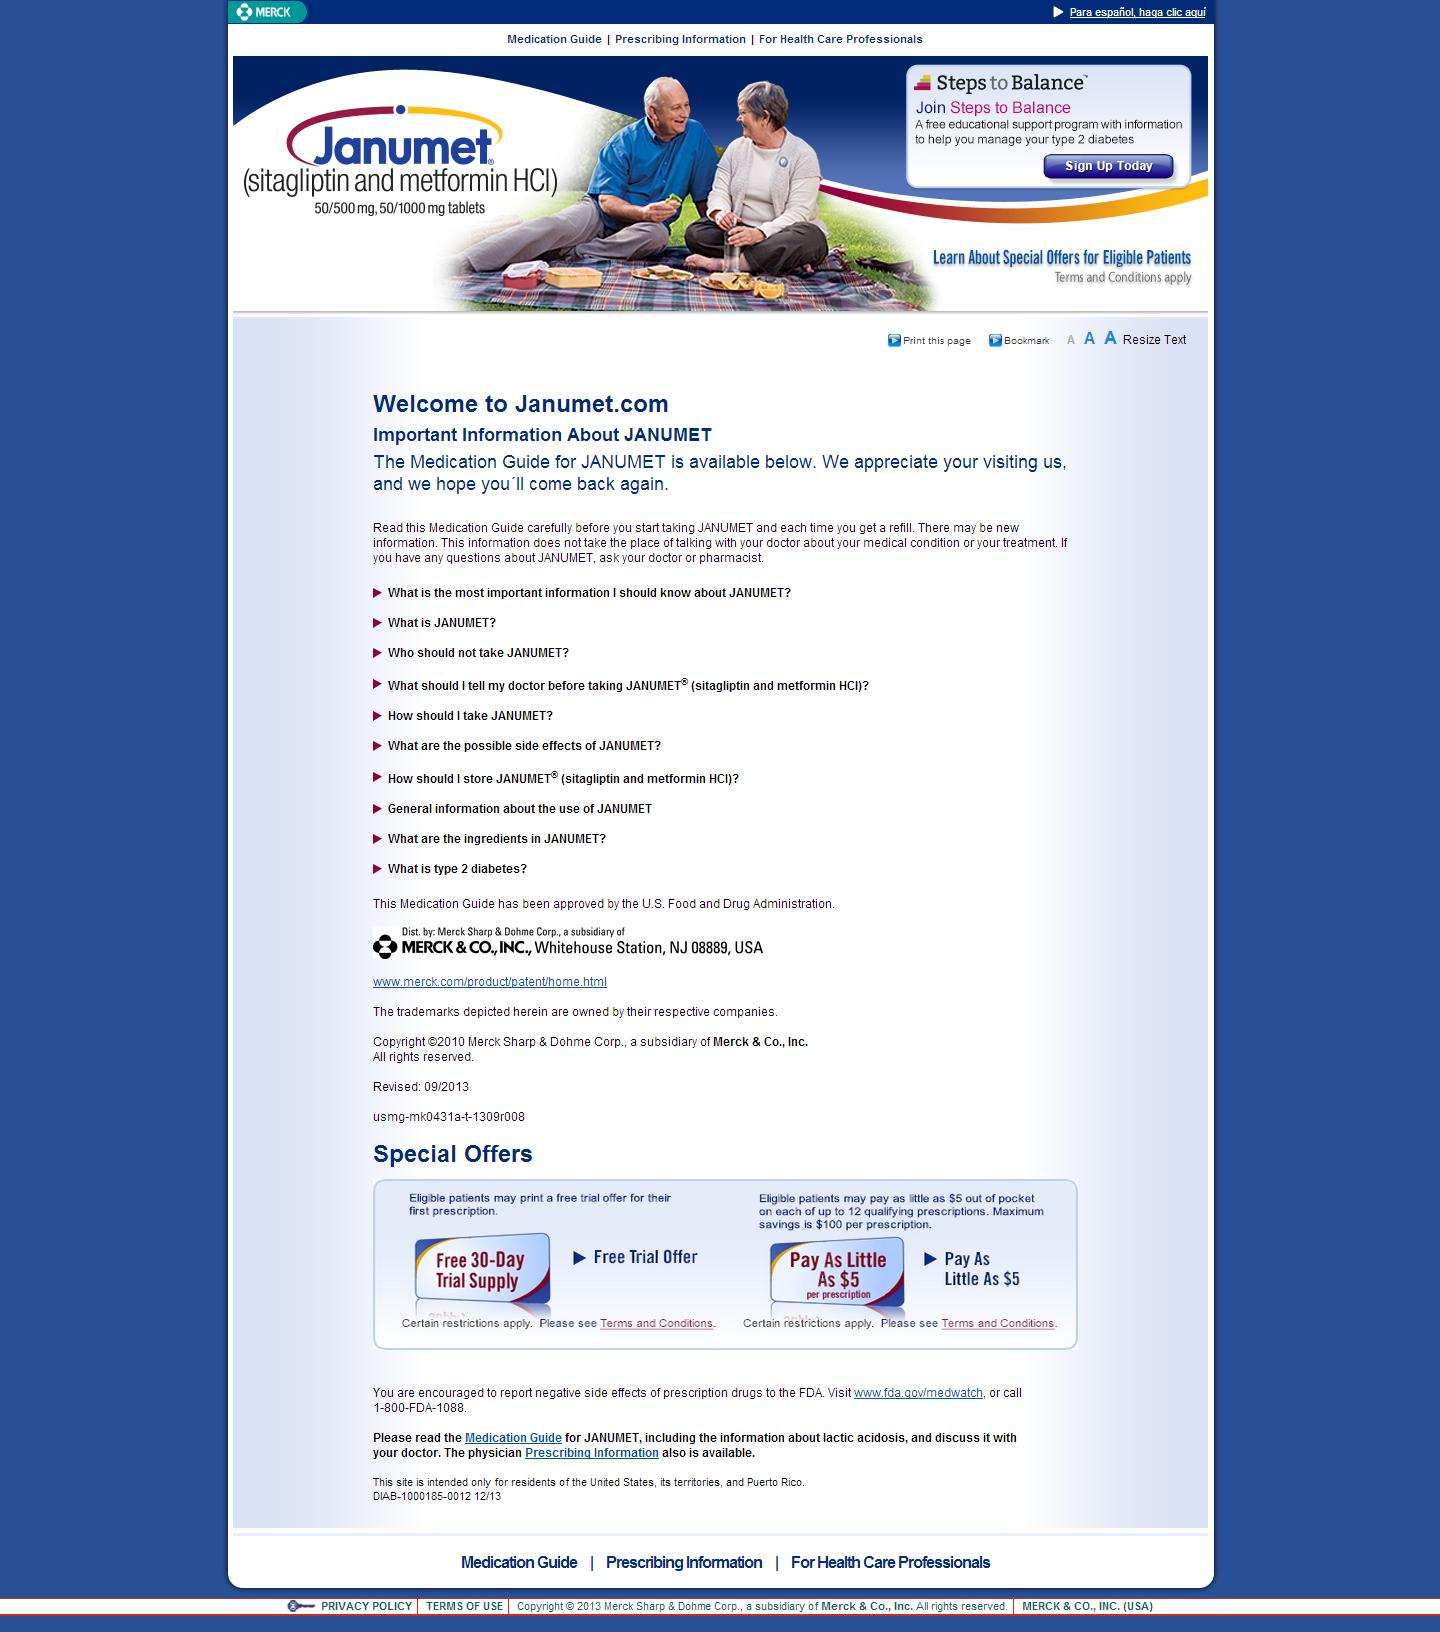 Janumet Informative Merck Co Medical